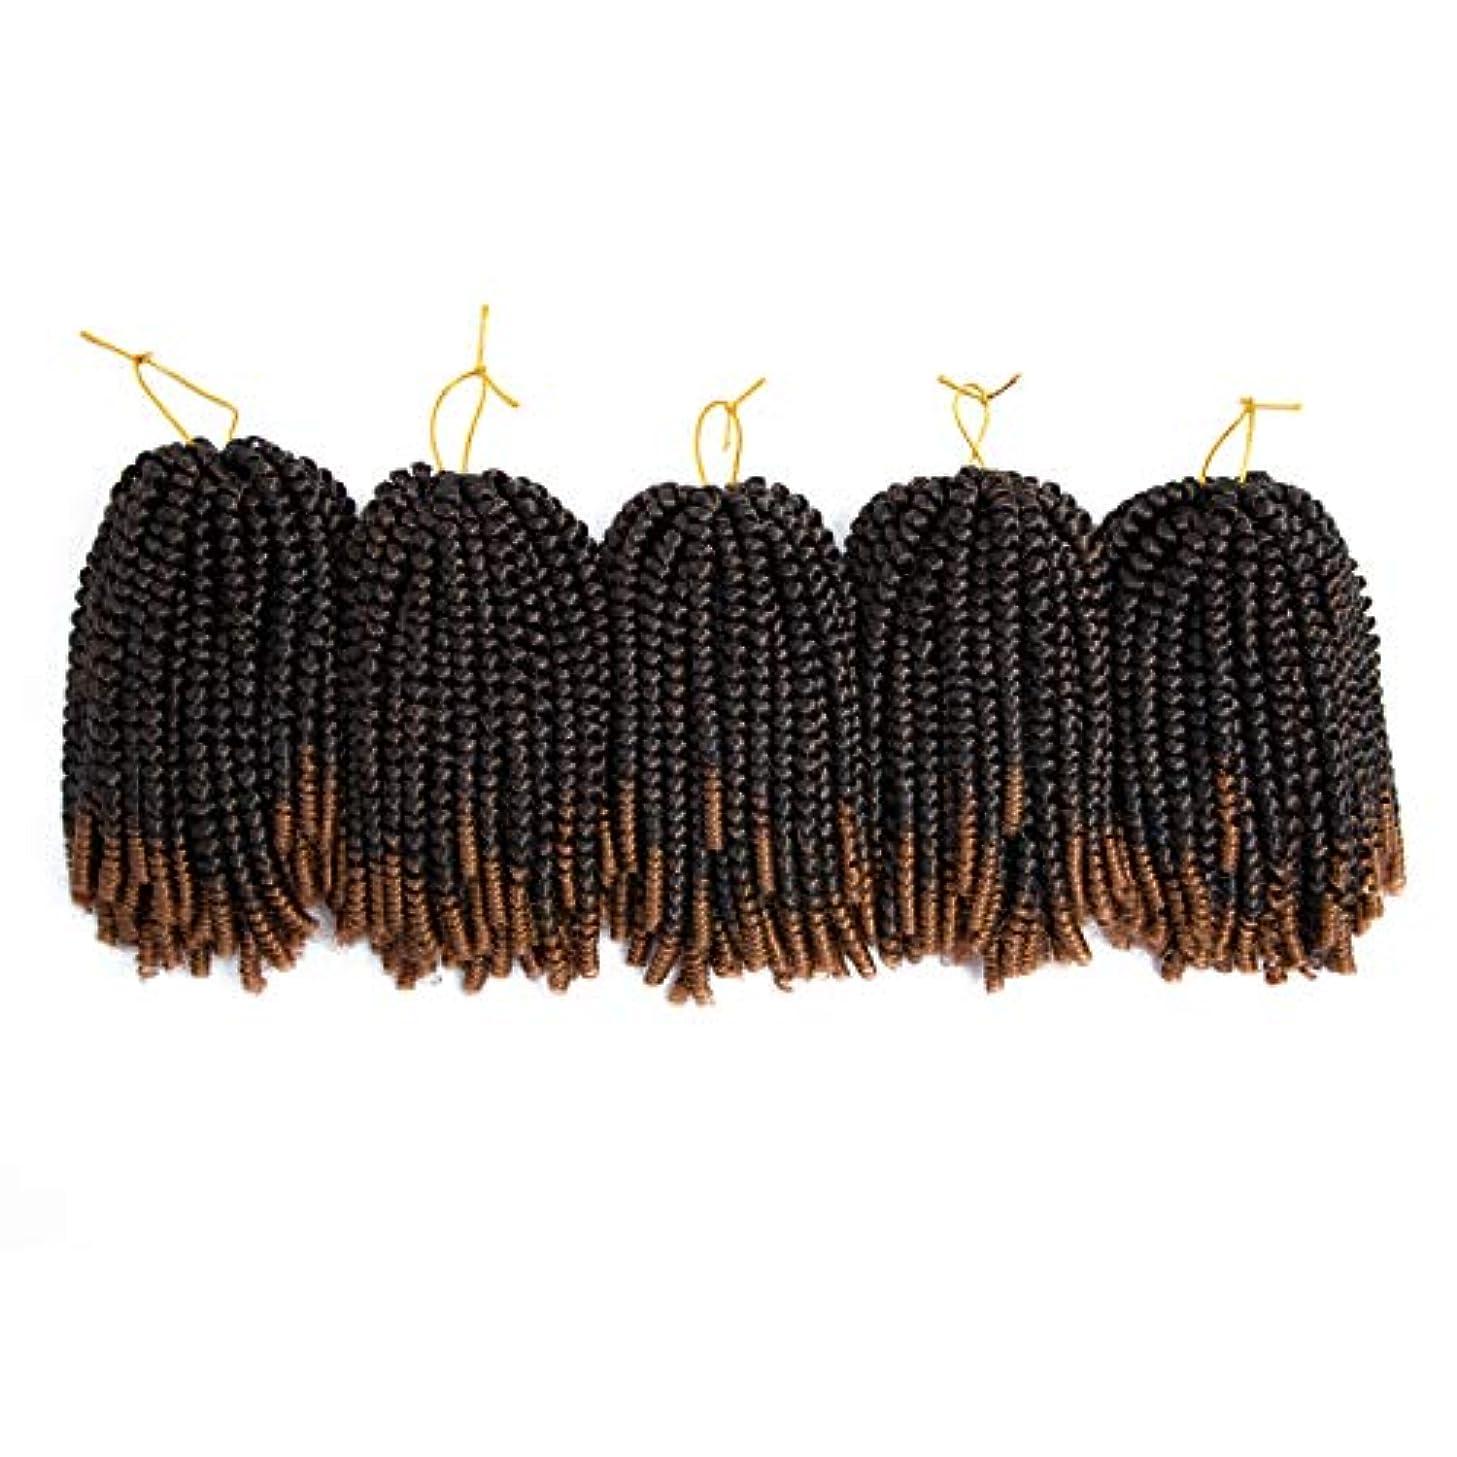 5 Pack Spring Twist Crochet Braids Bomb Twist Crochet Hair T1B/30 Ombre Colors High Temperature Fiber 8-Inch 110g/Bundle